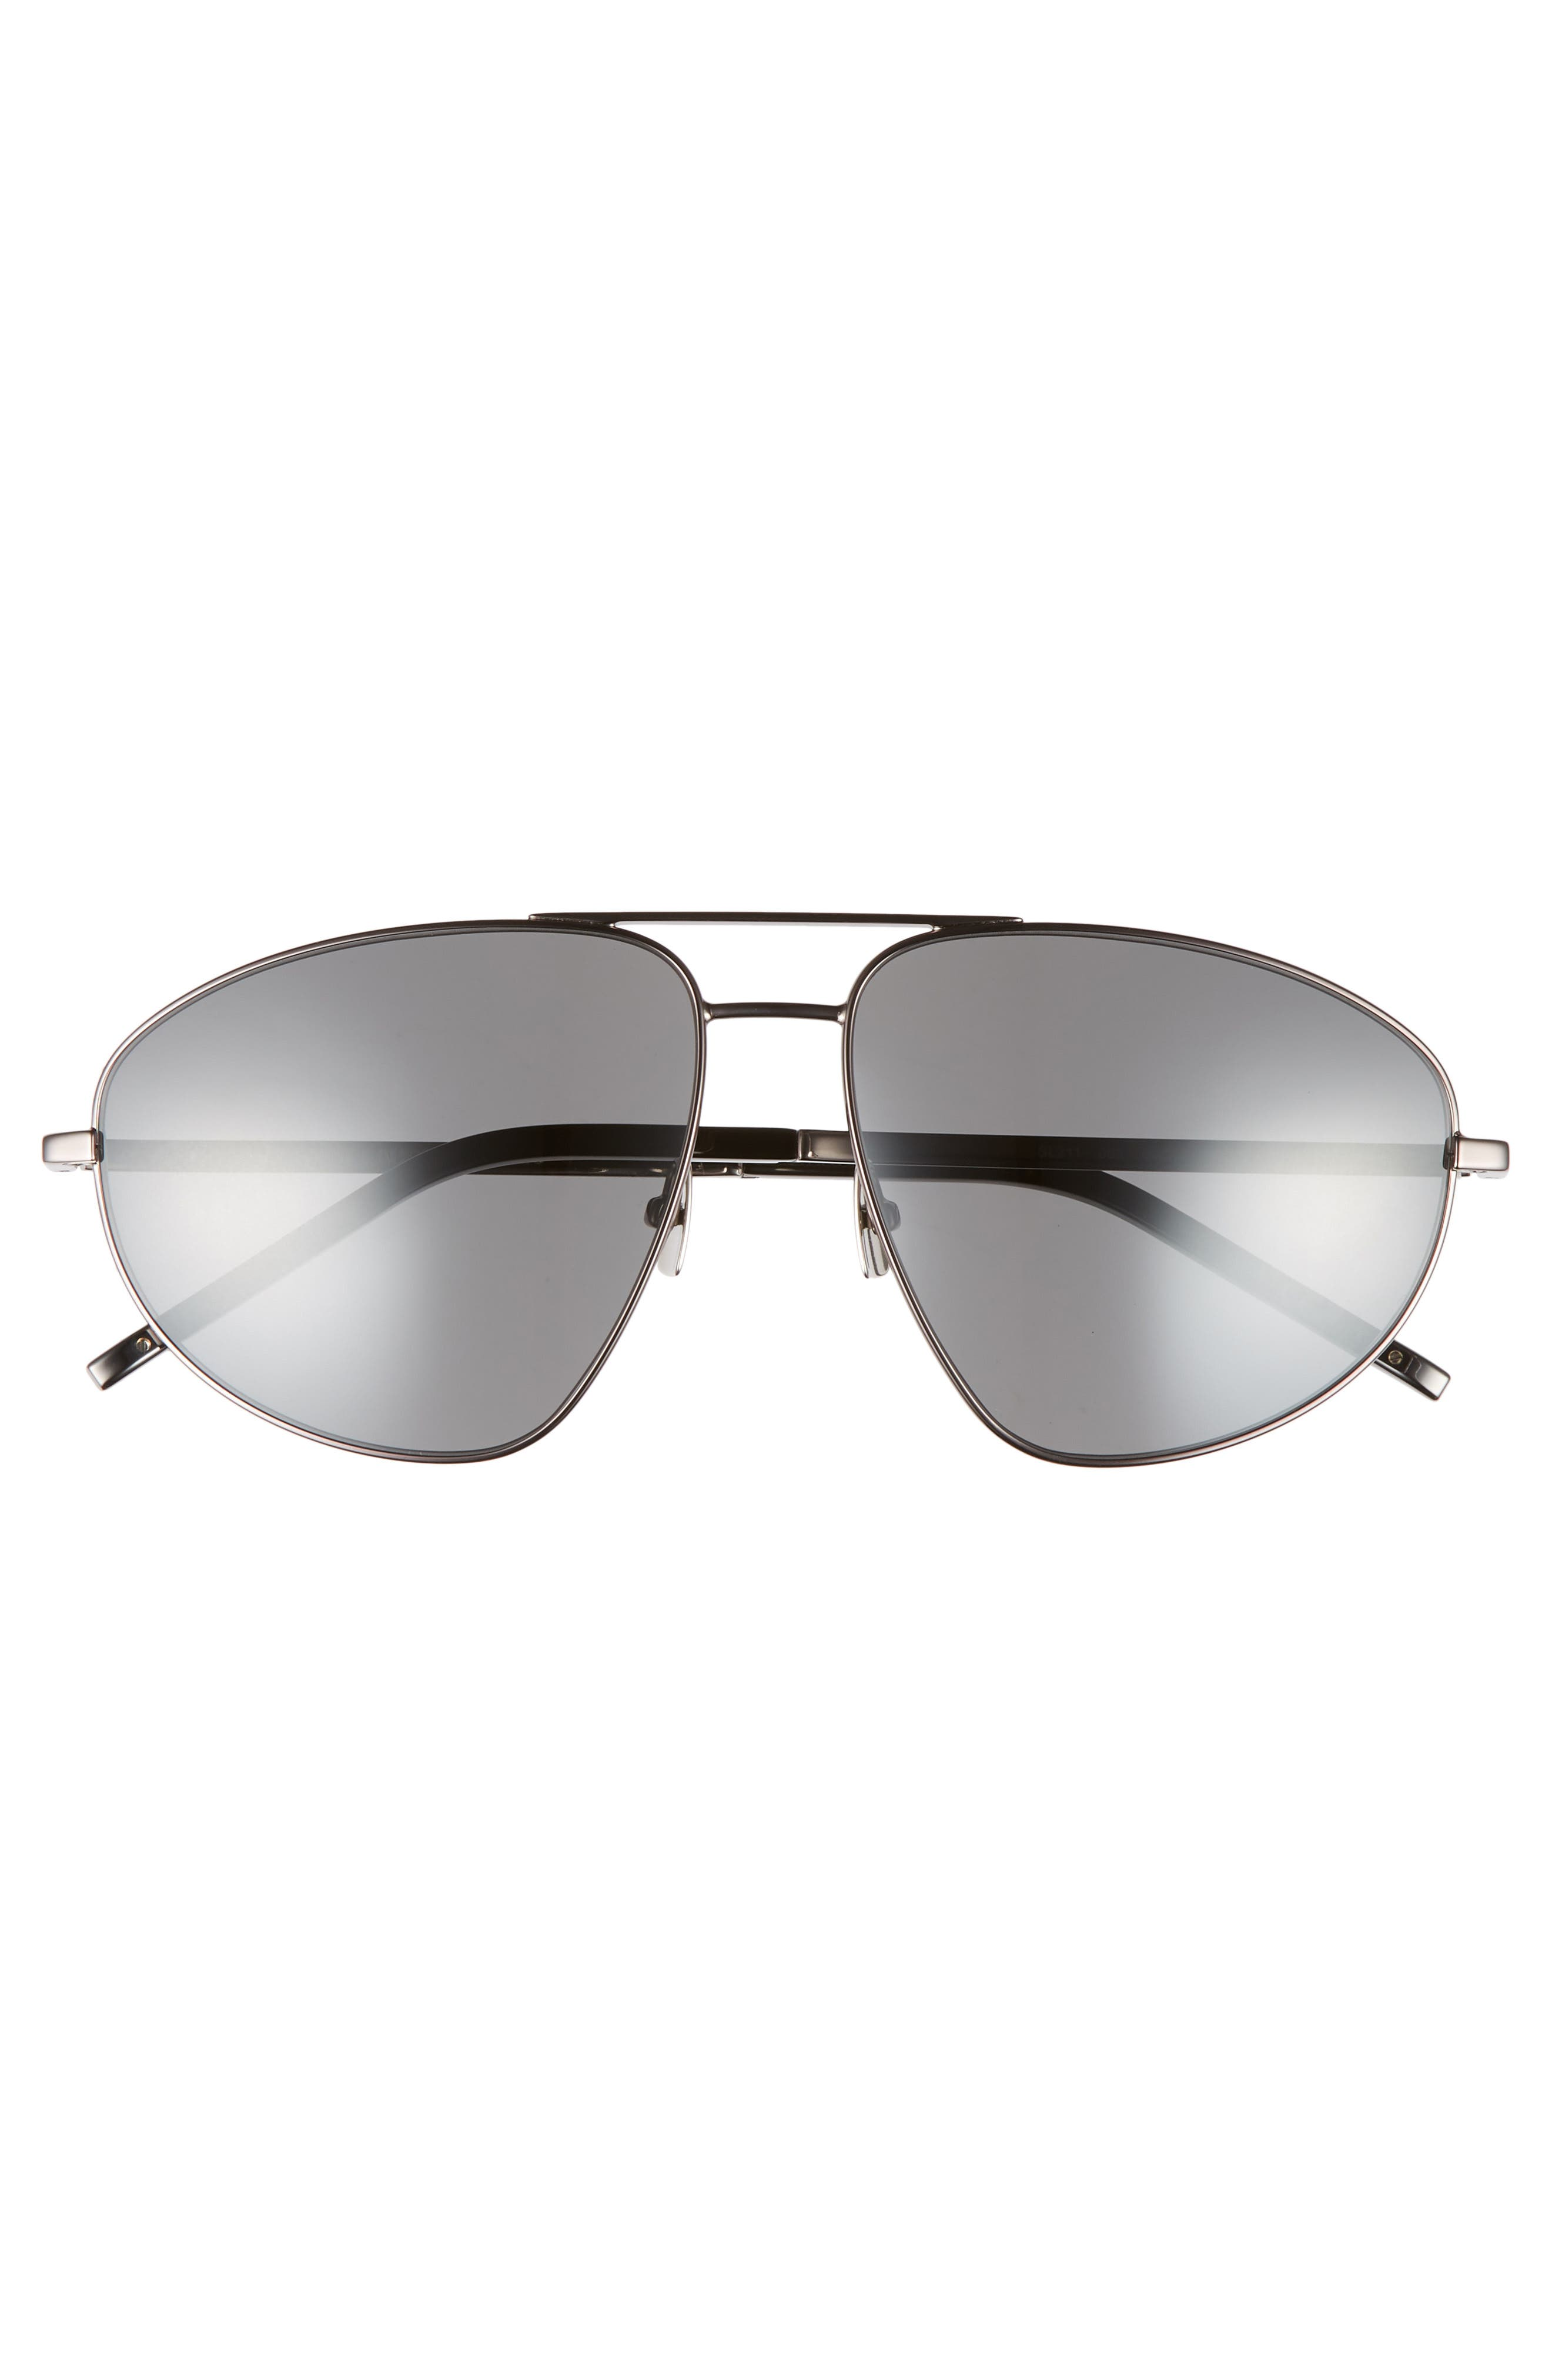 SL 211 60mm Aviator Sunglasses,                             Alternate thumbnail 2, color,                             Dark Ruthenium/ Black